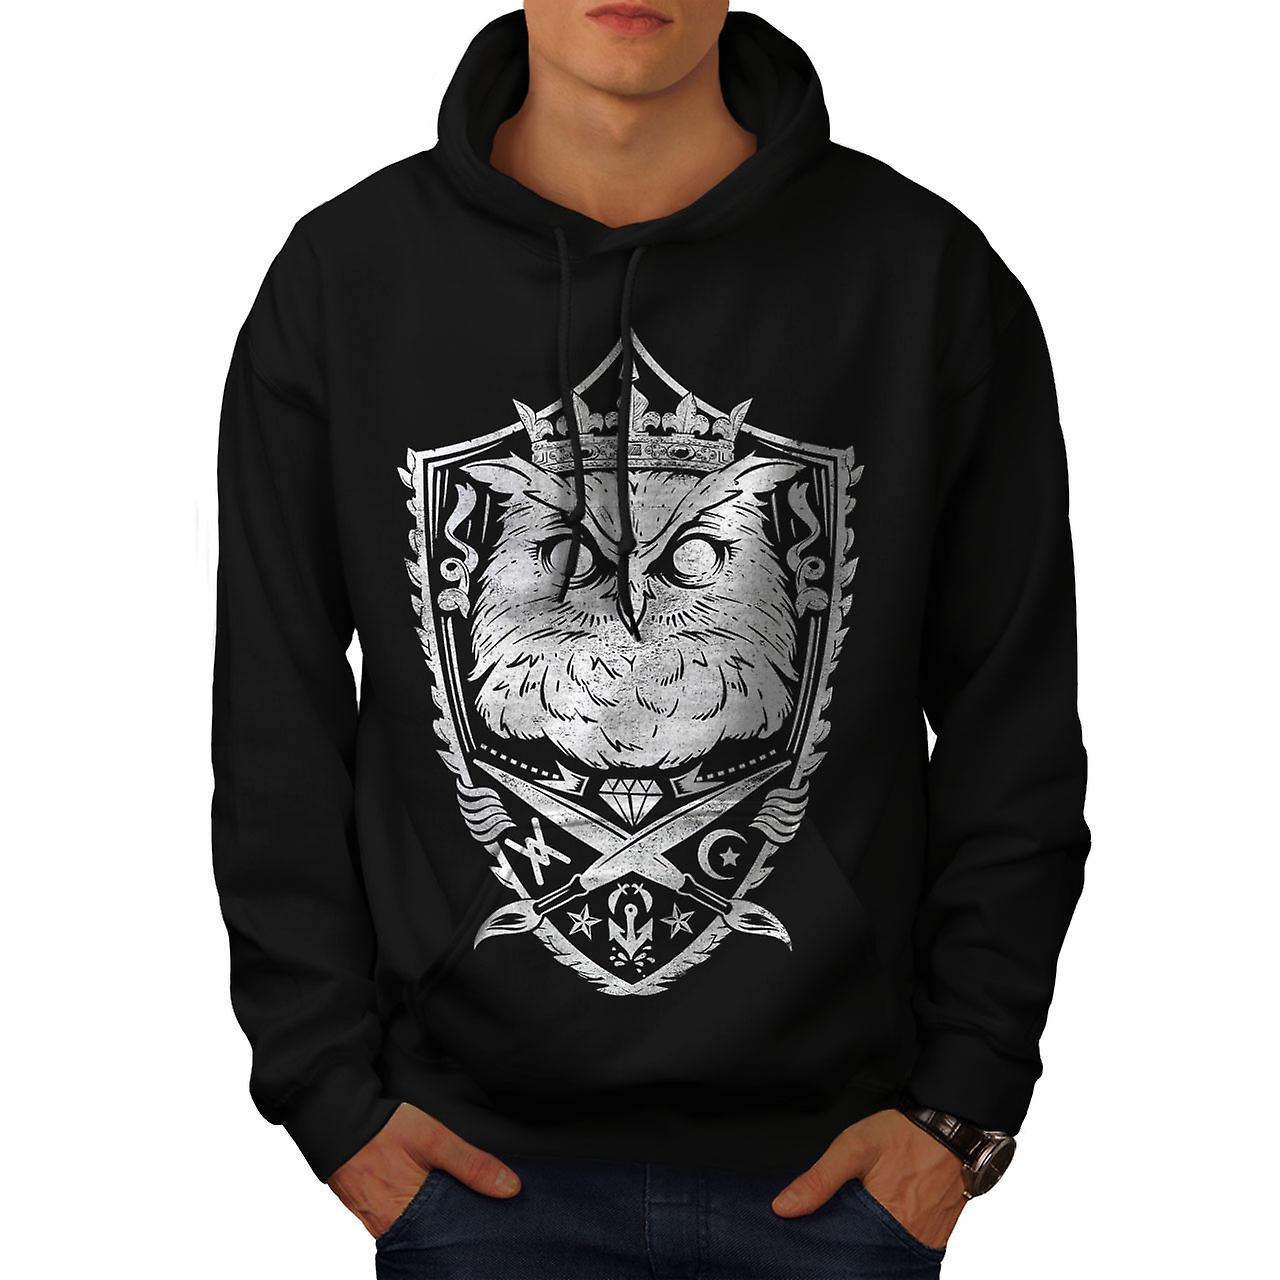 Owl King Knight Animal Men Black Hoodie | Wellcoda